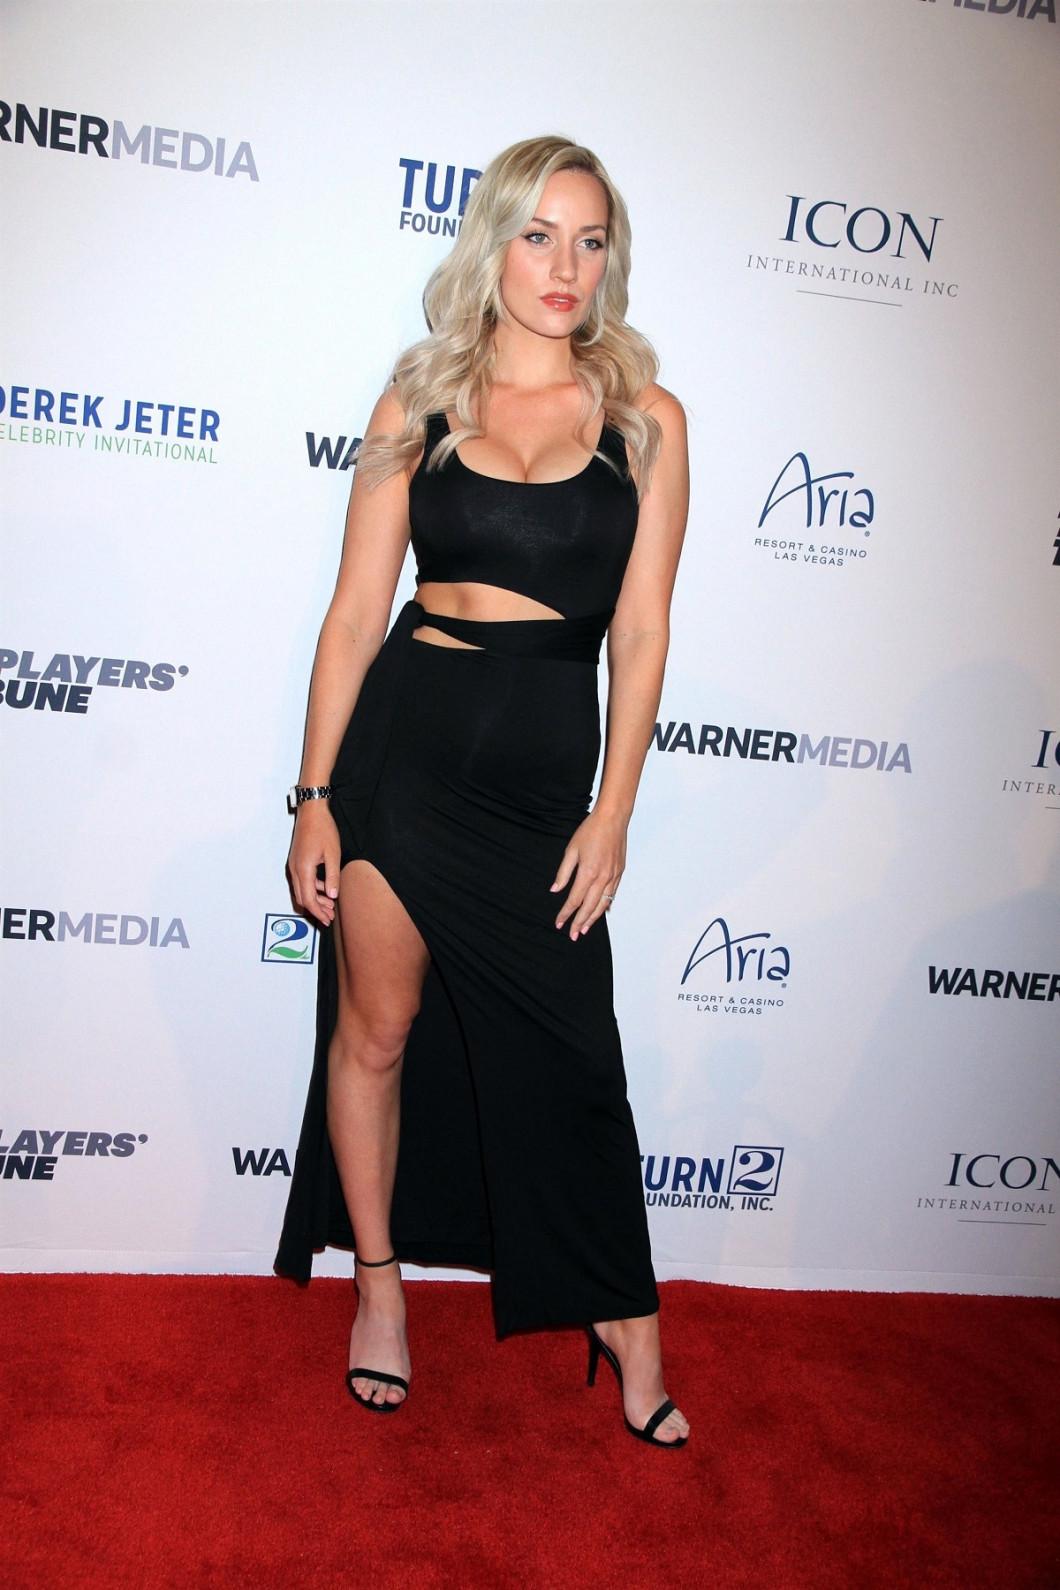 Guest arrivals for the 2019 Derek Jeter Celebrity Invitational Gala in Las Vegas